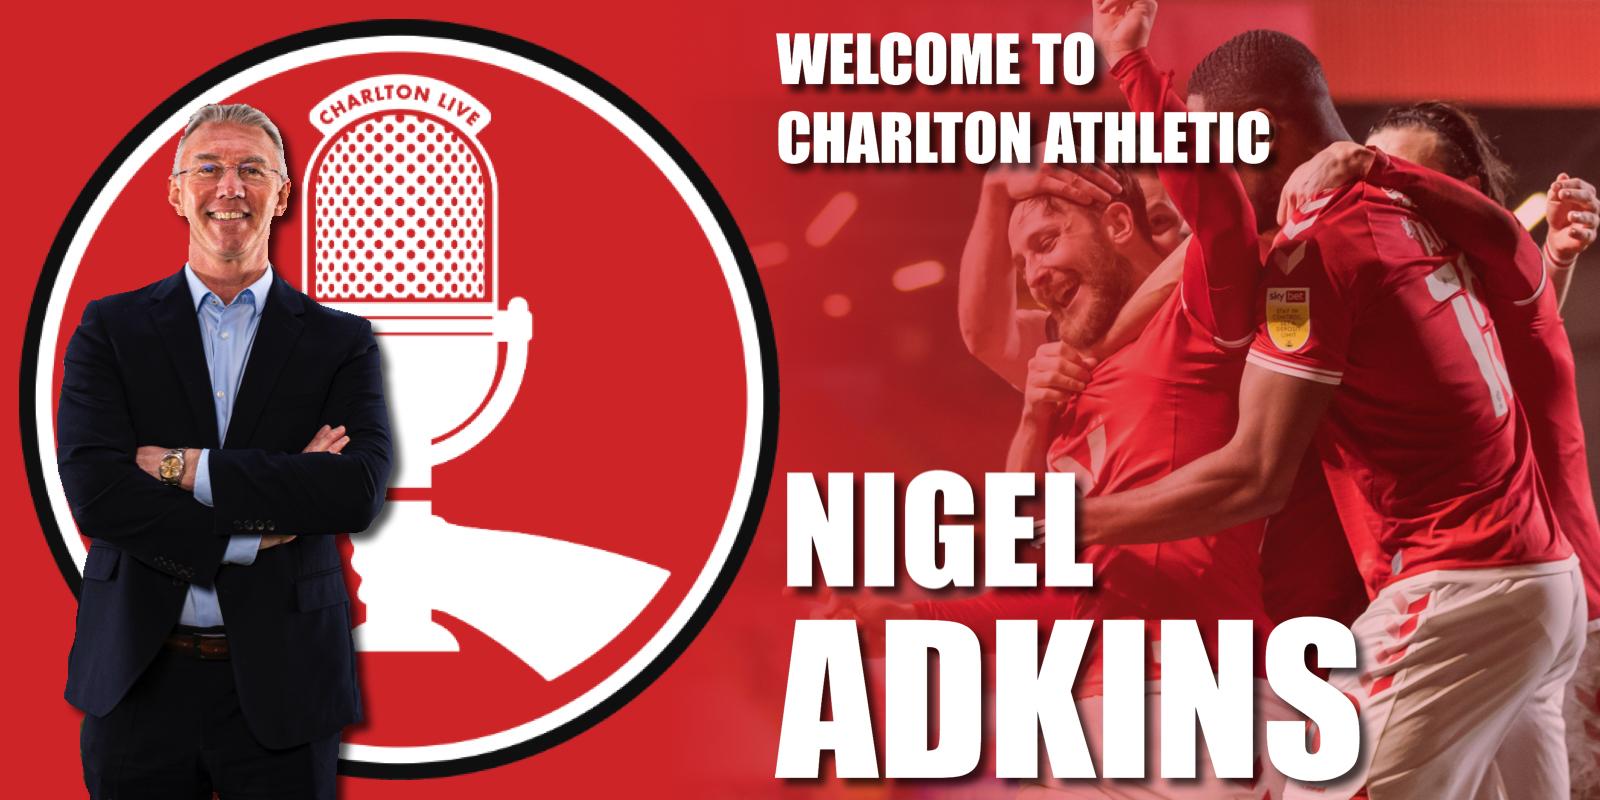 Charlton Live: Nigel Adkins arrival special